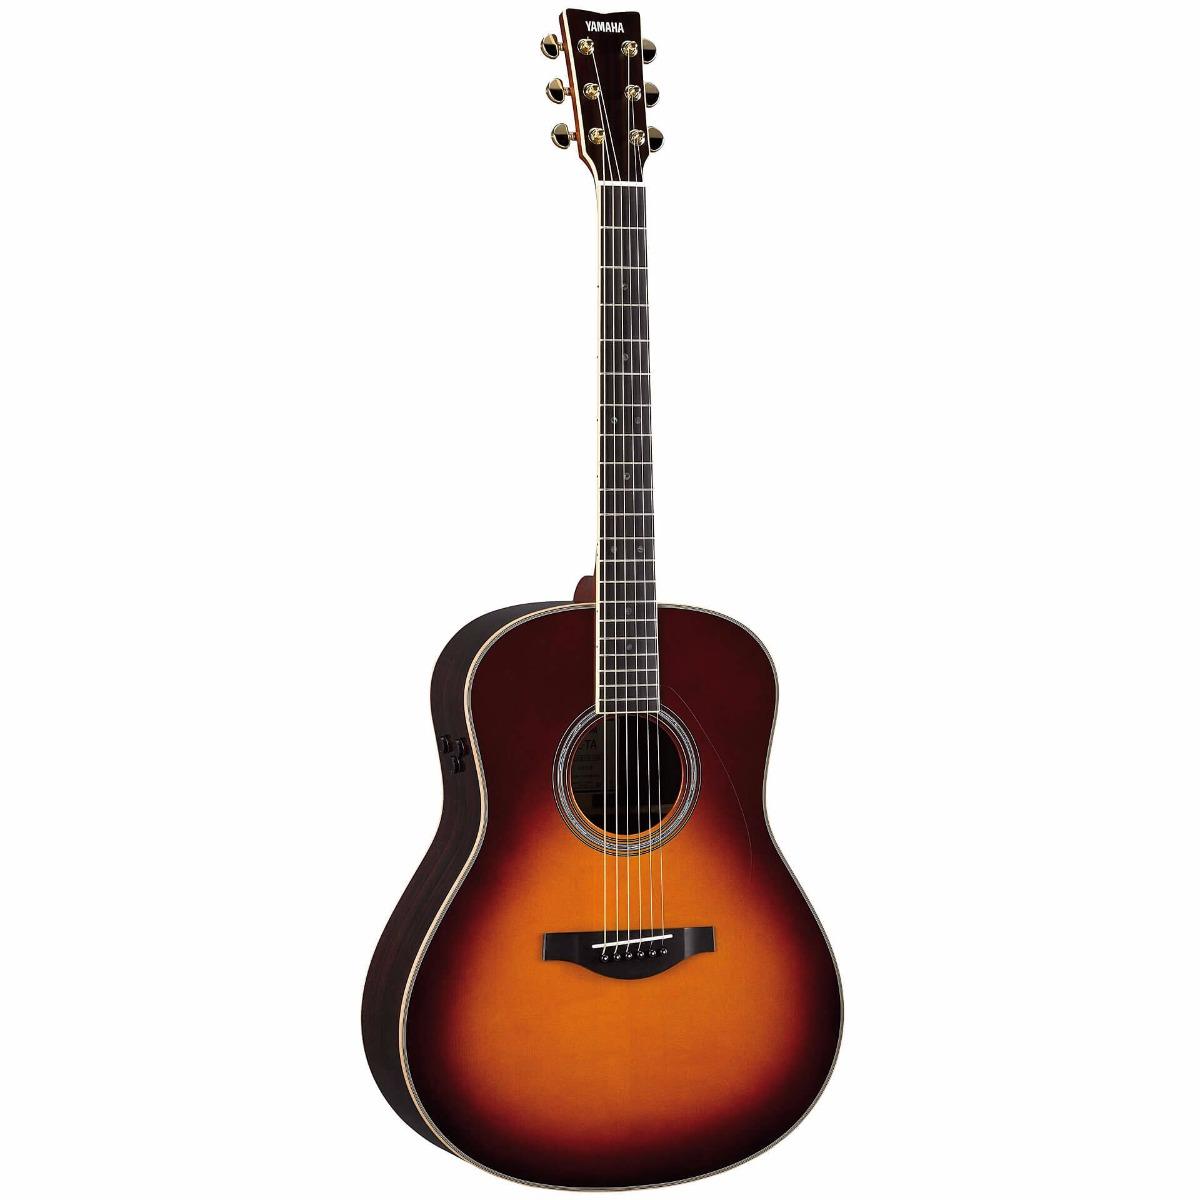 Yamaha LL-TA BS transacousticwestern-guitar brownsunburst